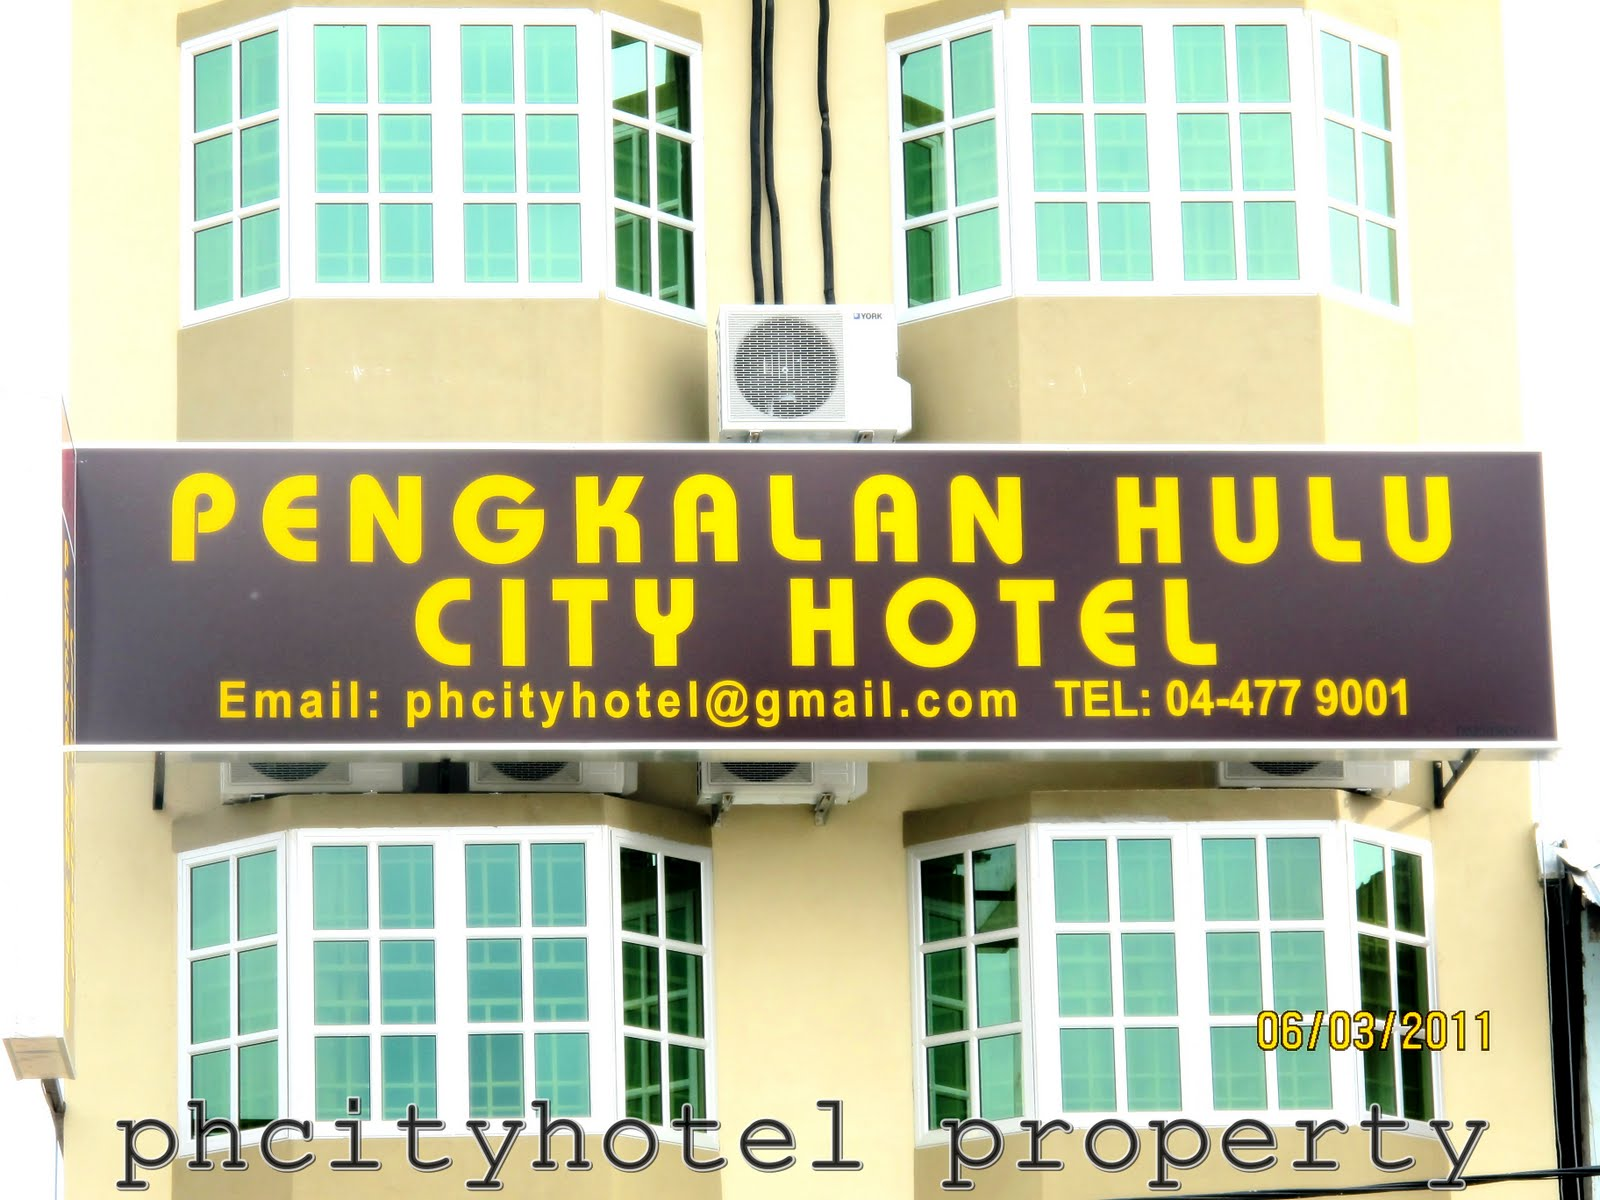 Pengkalan Hulu City Hotel: OUR BUILDING